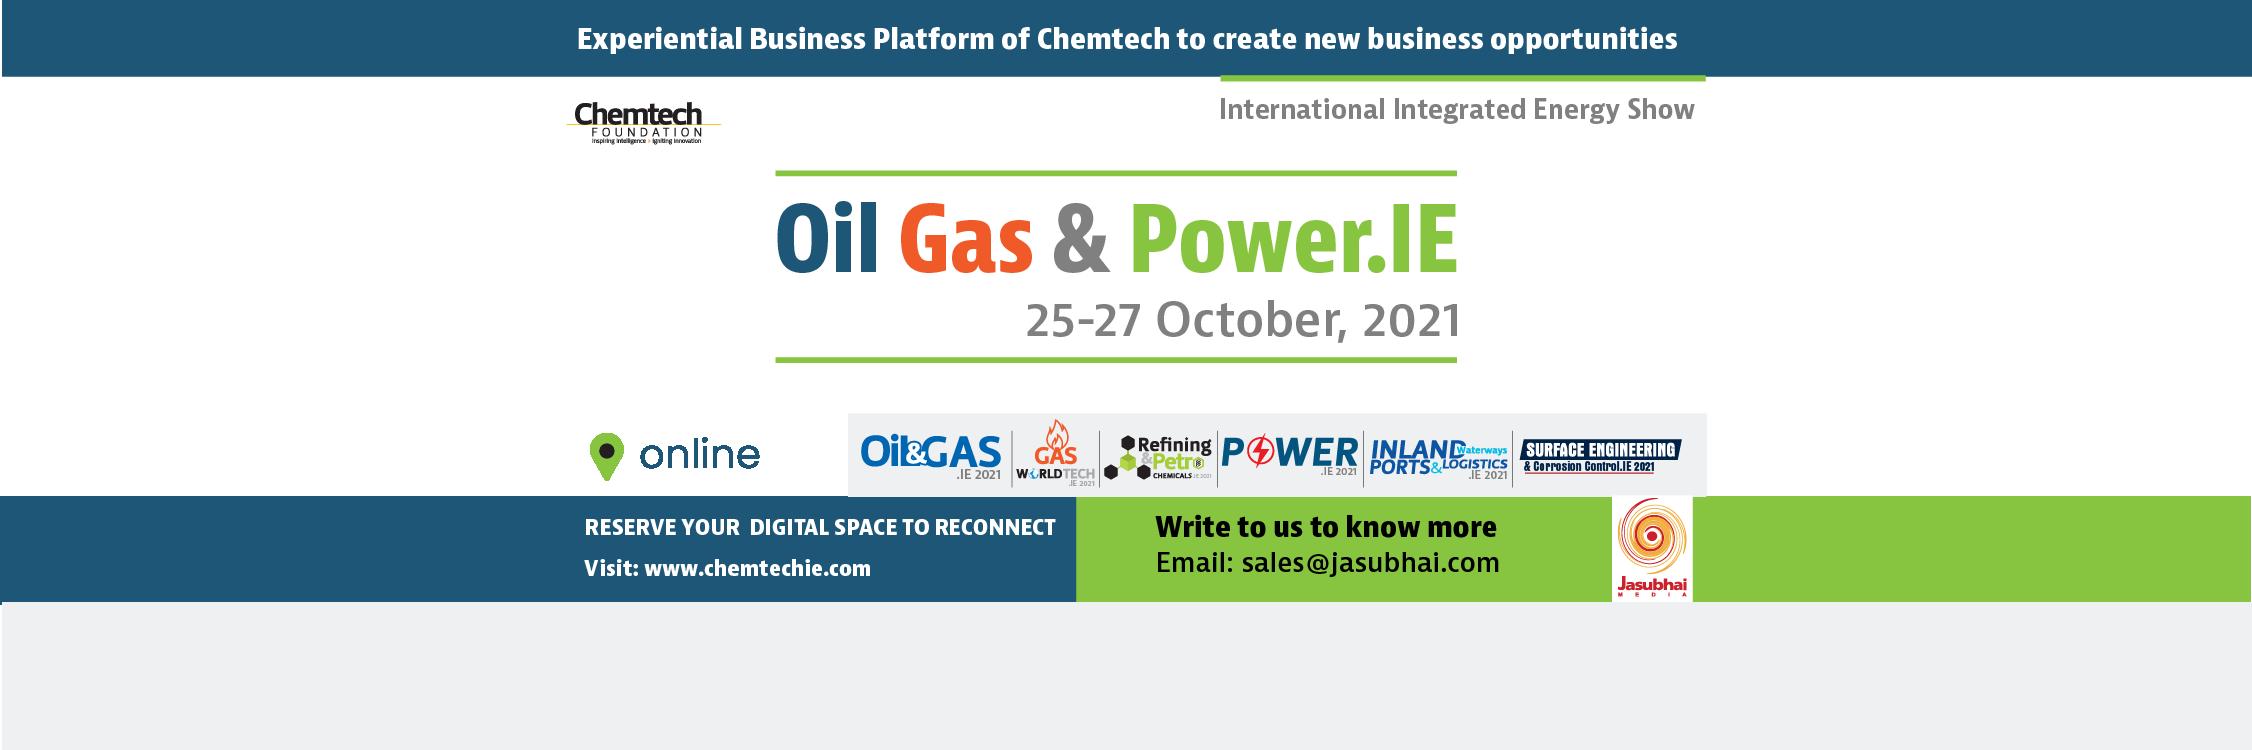 OilGas&Power.IE 2021